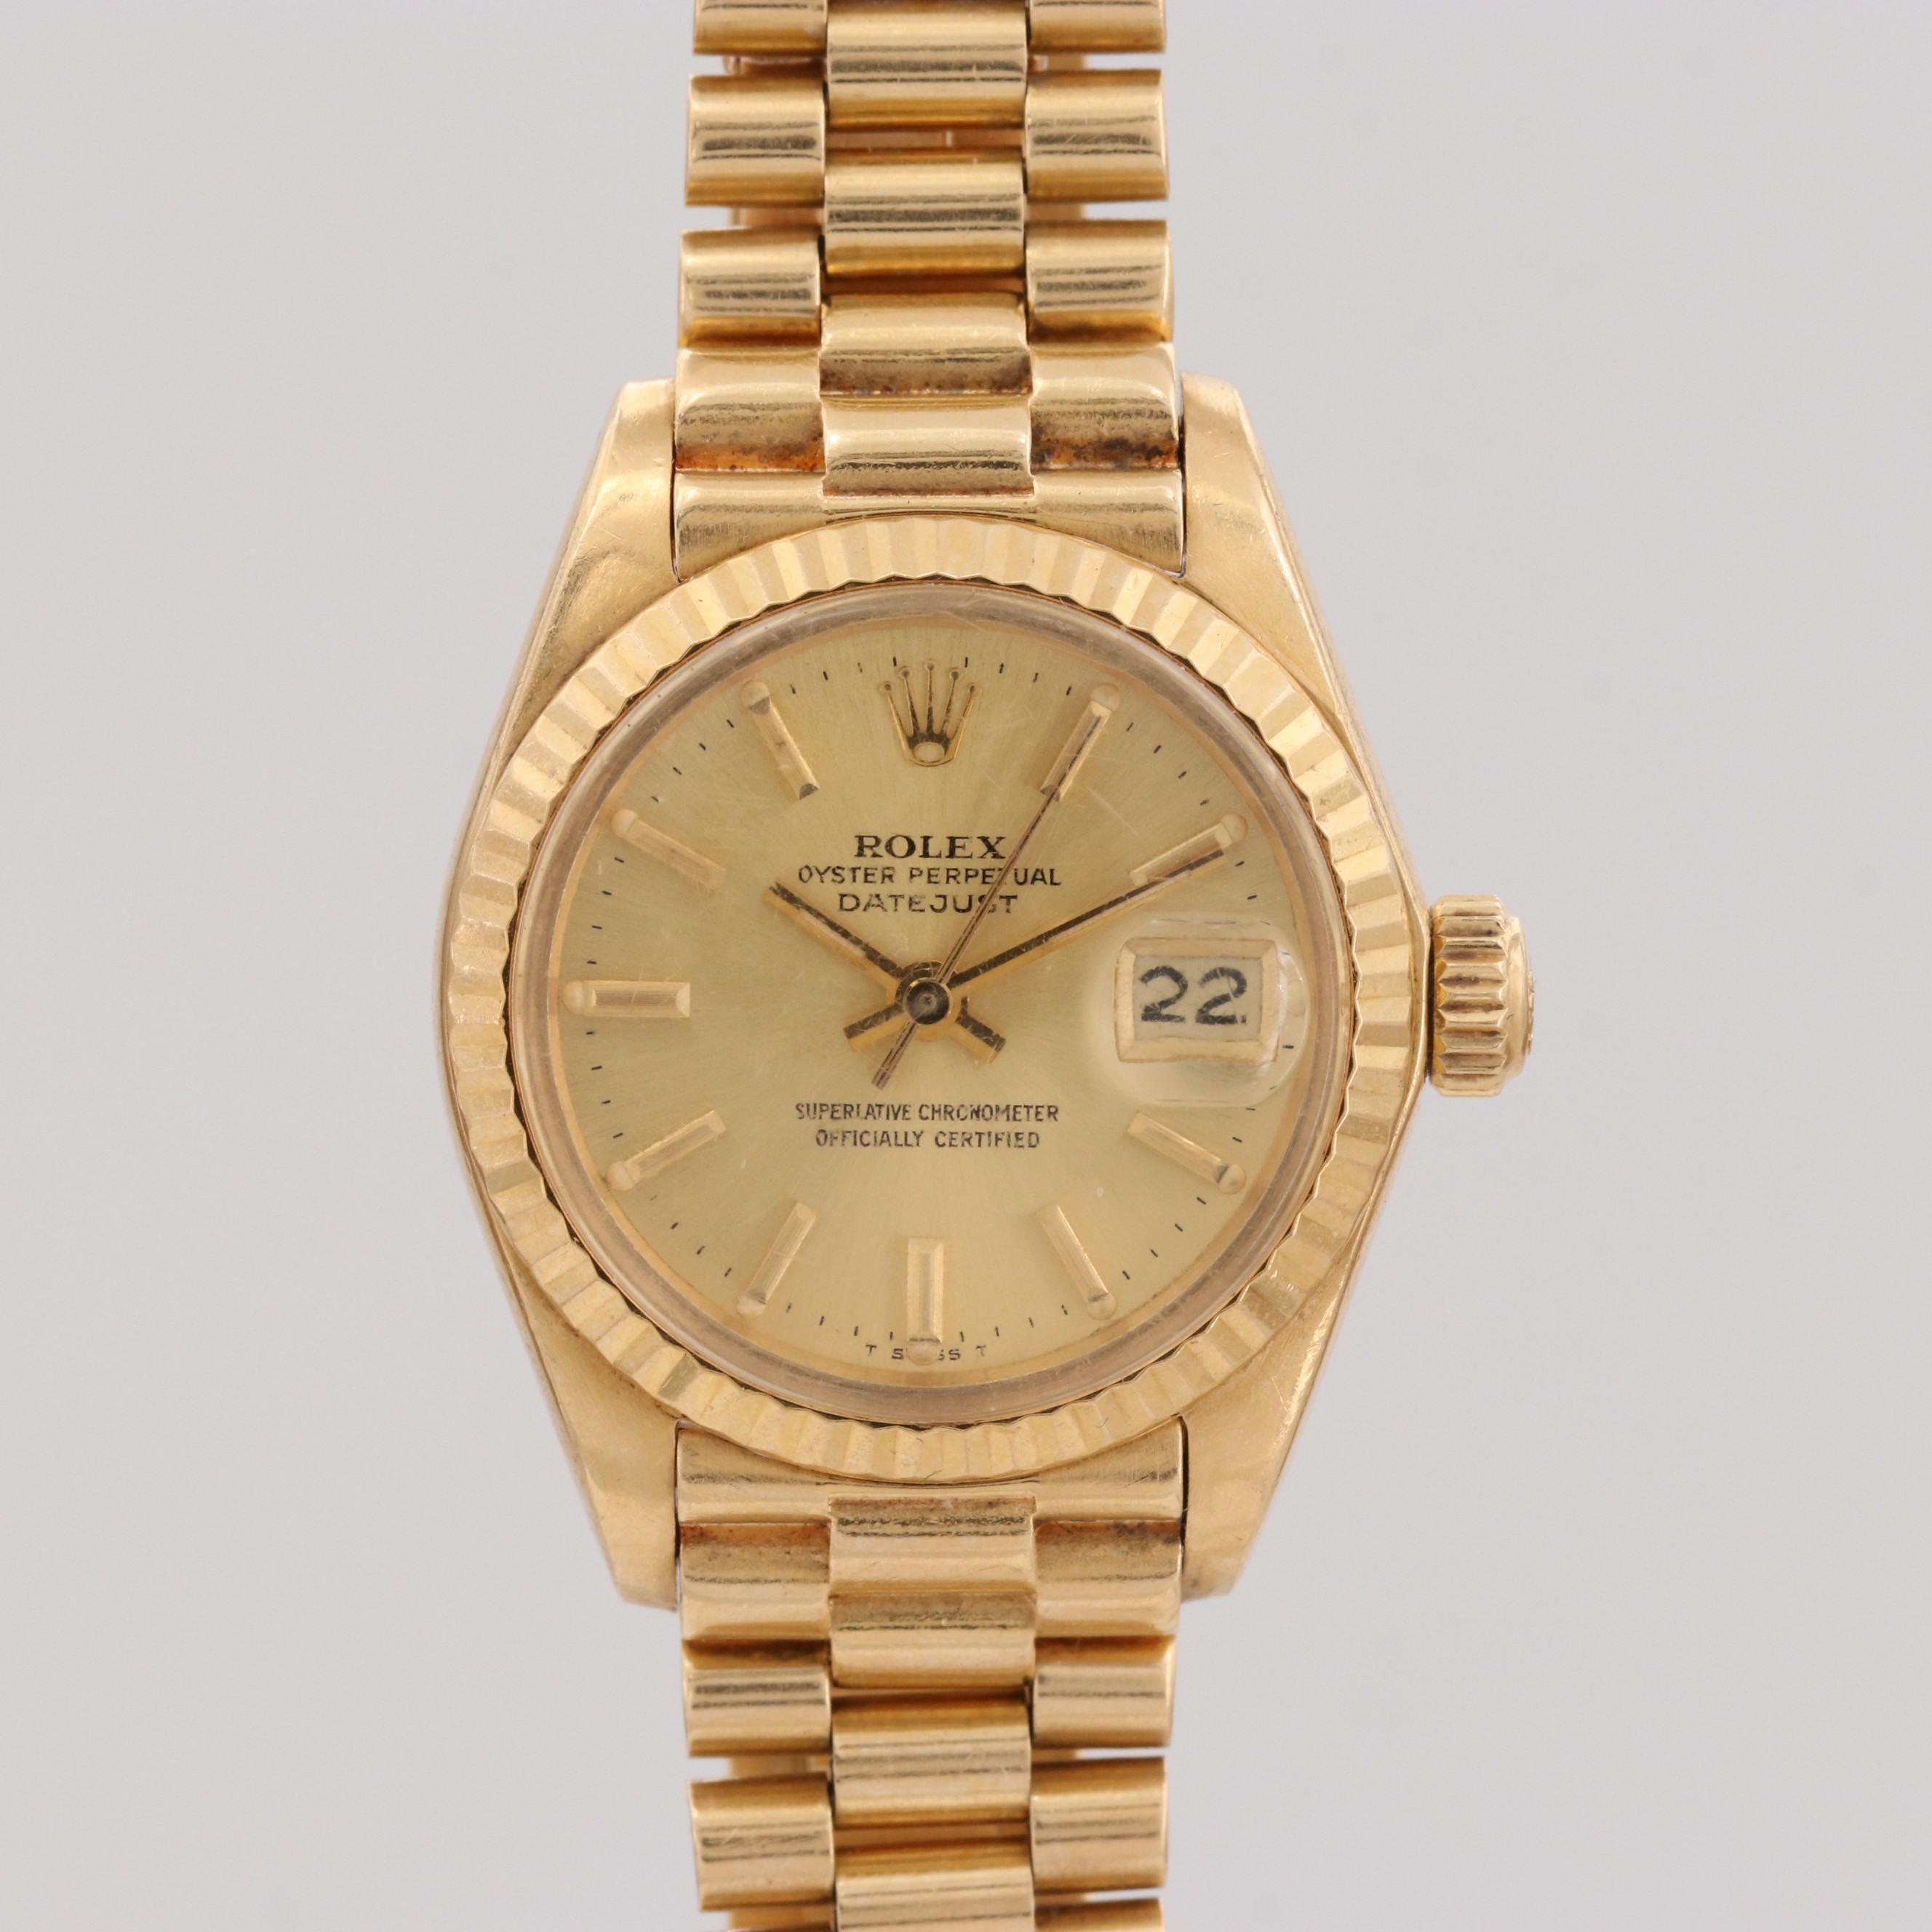 Rolex Ladies President Datejust 18K Yellow Gold Wristwatch, 1979